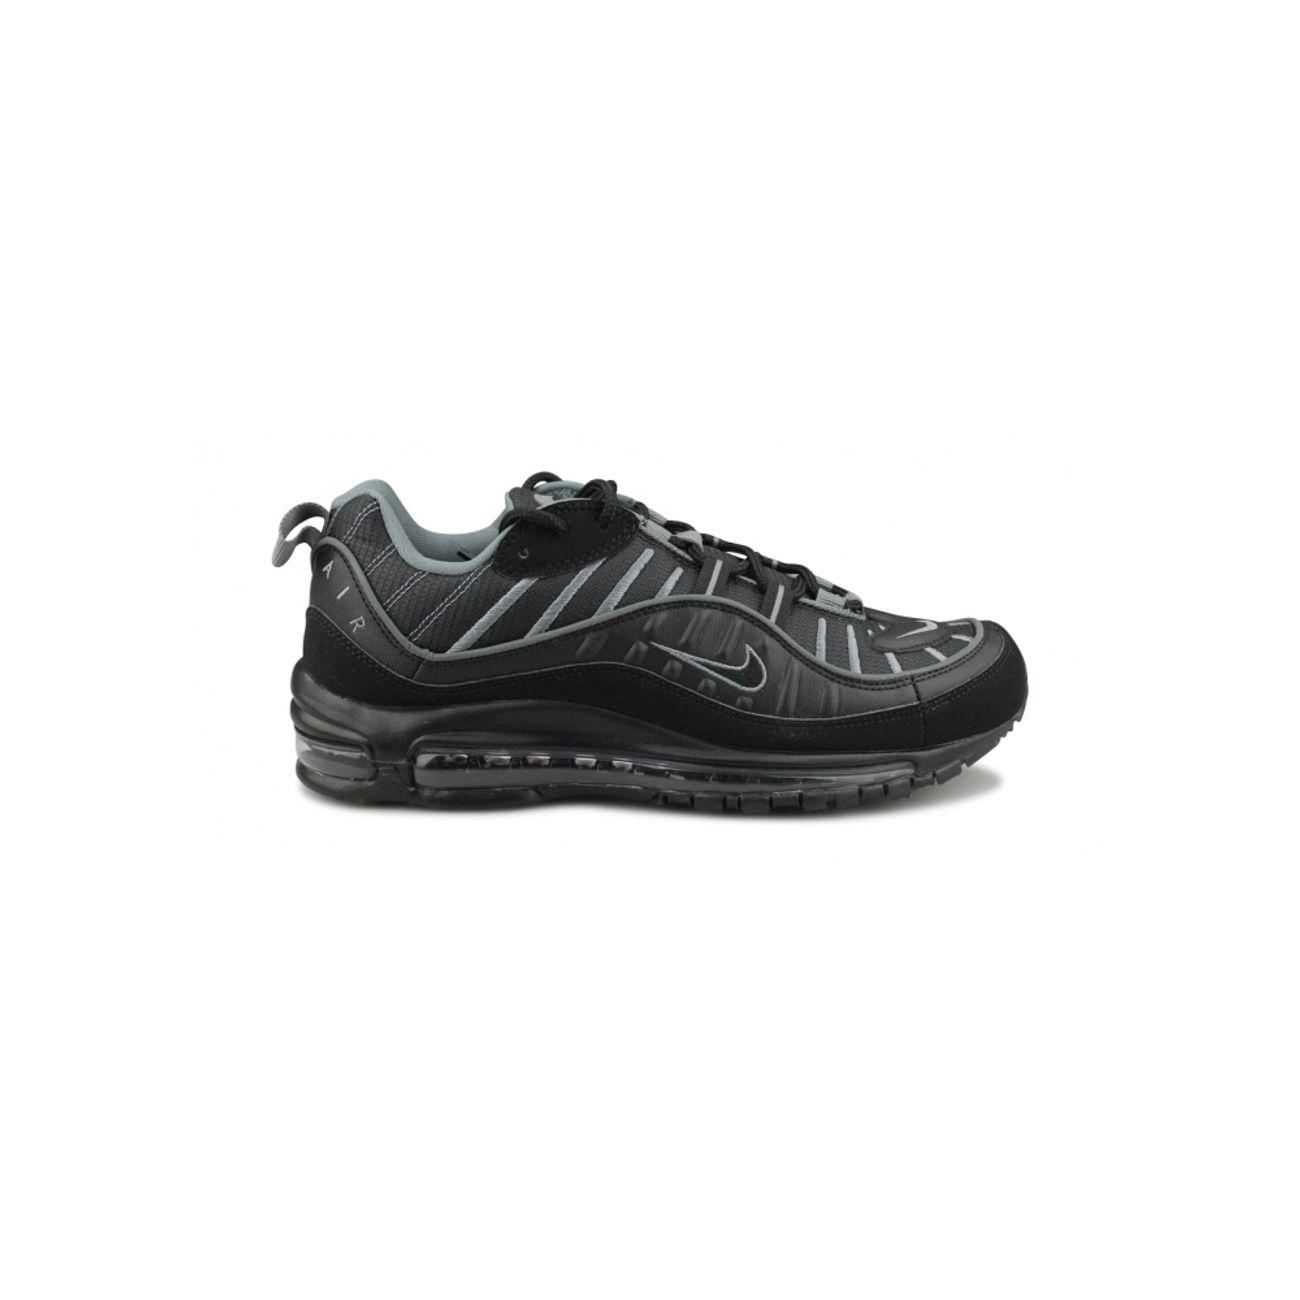 Mode- Lifestyle homme NIKE Basket Nike Air Max 98 Noir Ci3693-002